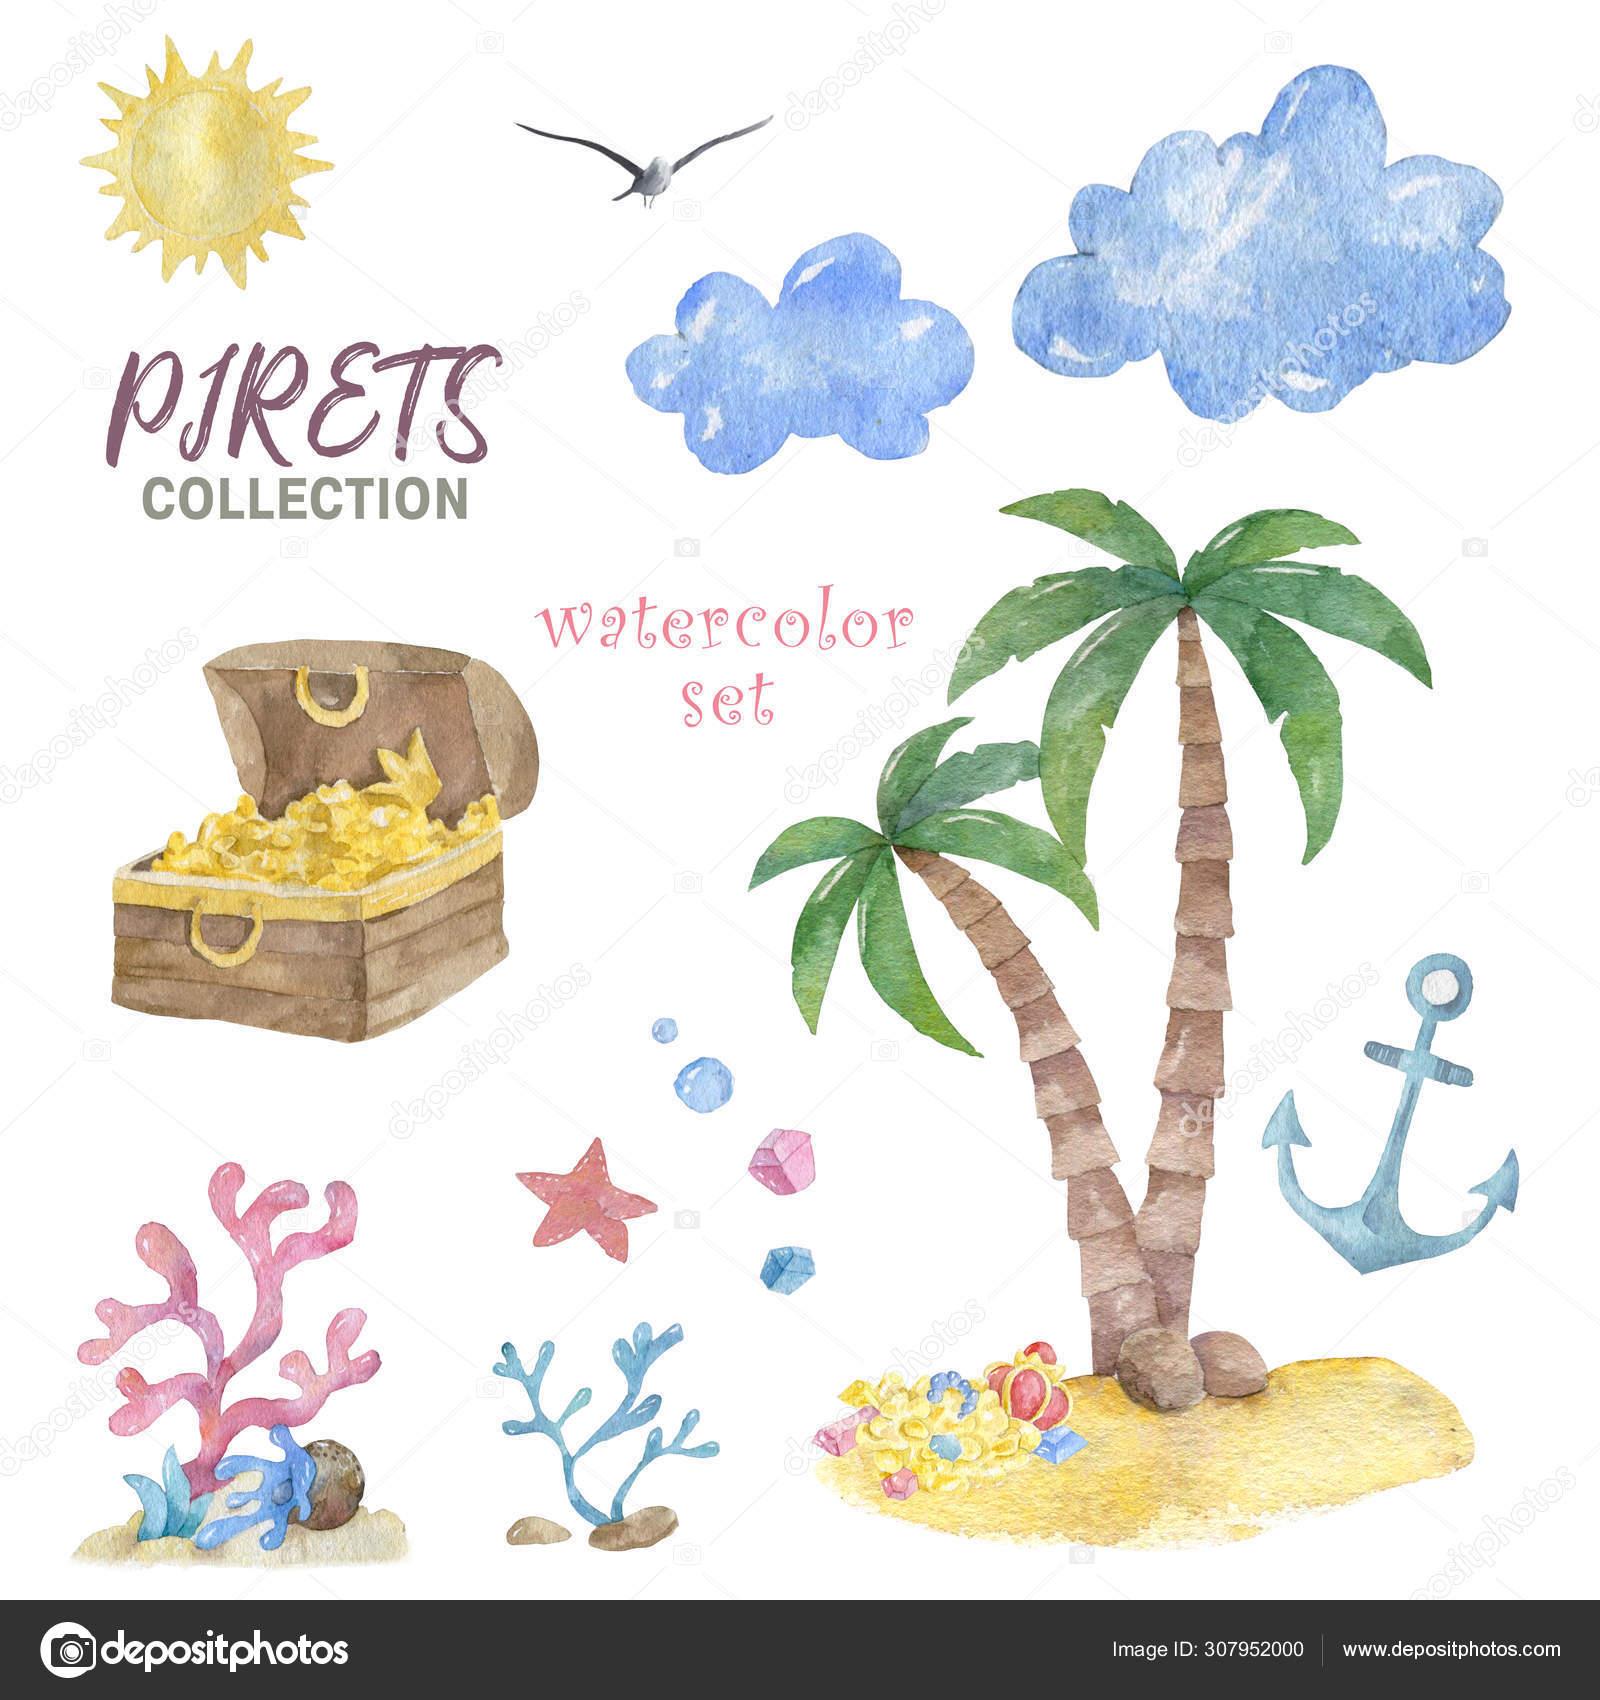 Watercolor ocean waves clipart summer beach invitation Sea   Etsy in 2020   Watercolor  ocean, Ocean drawing, Wave clipart